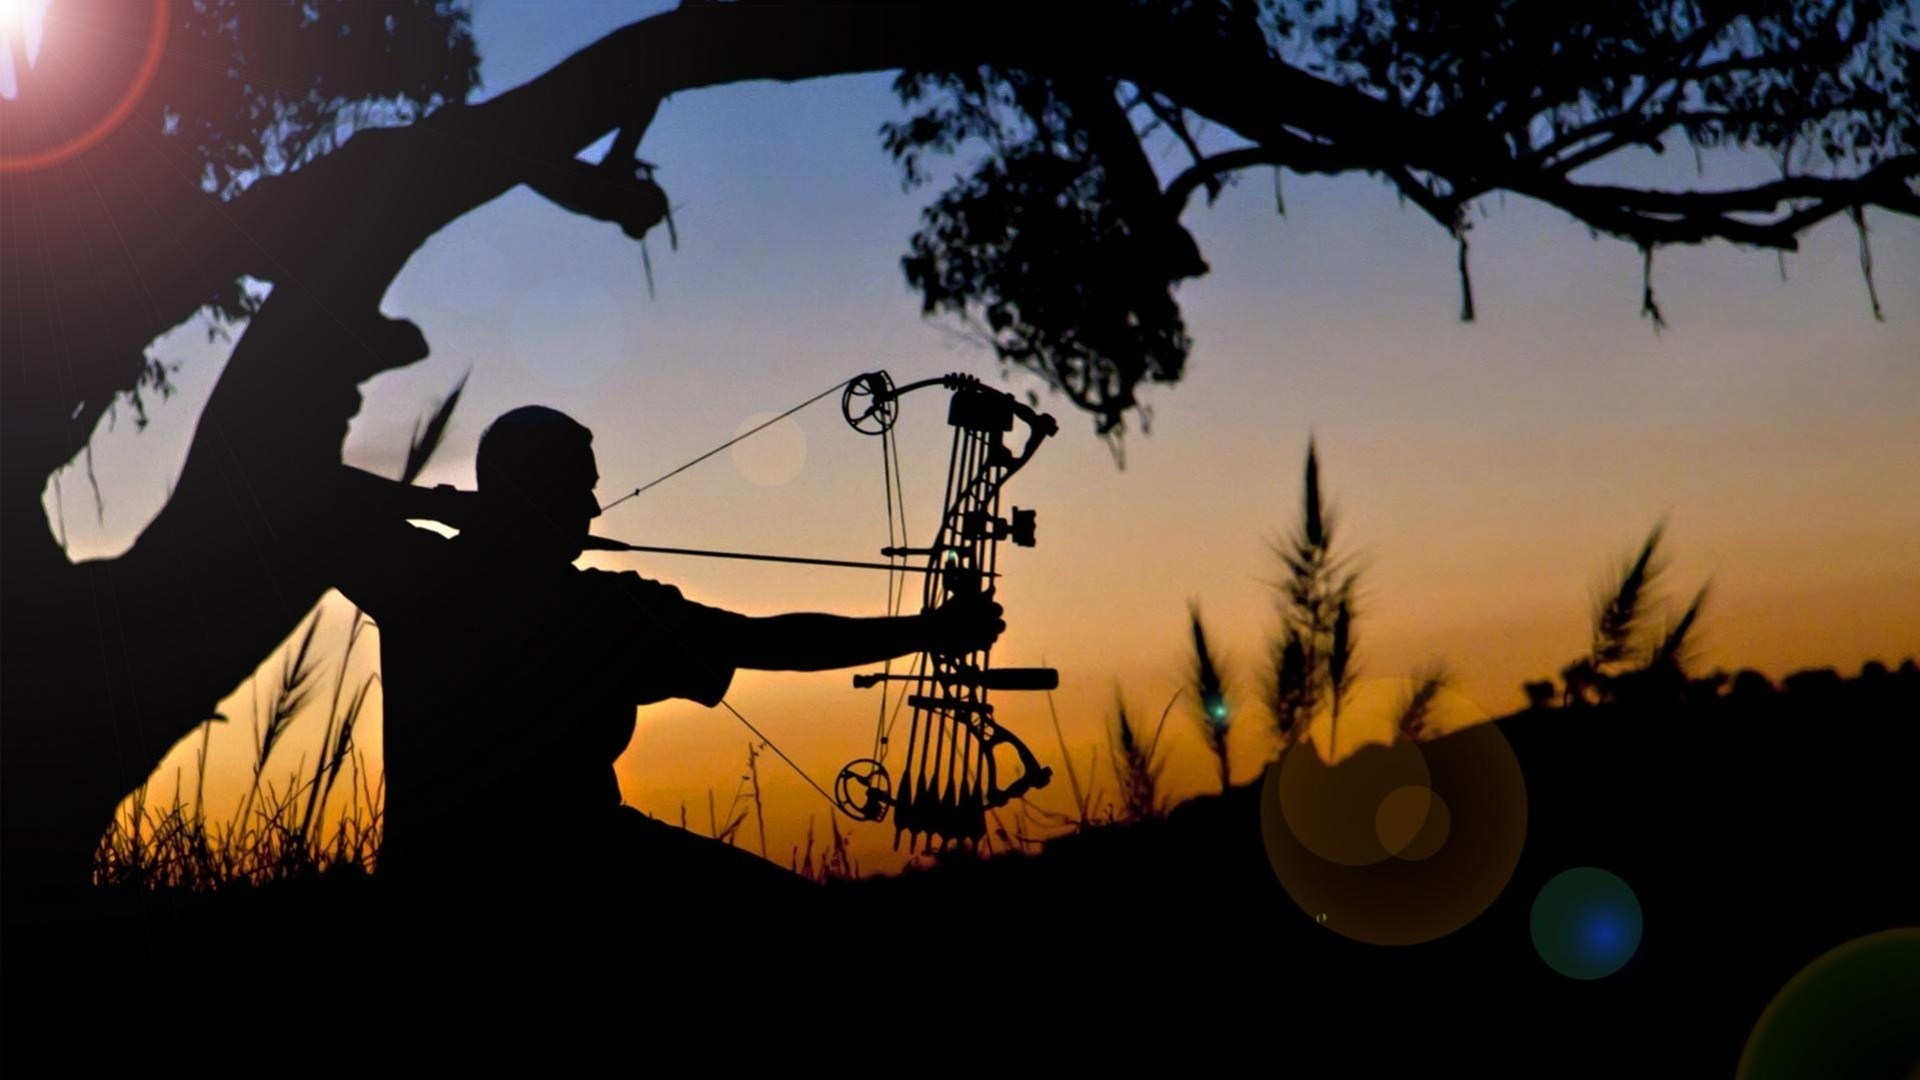 Archery wallpaper photo hd